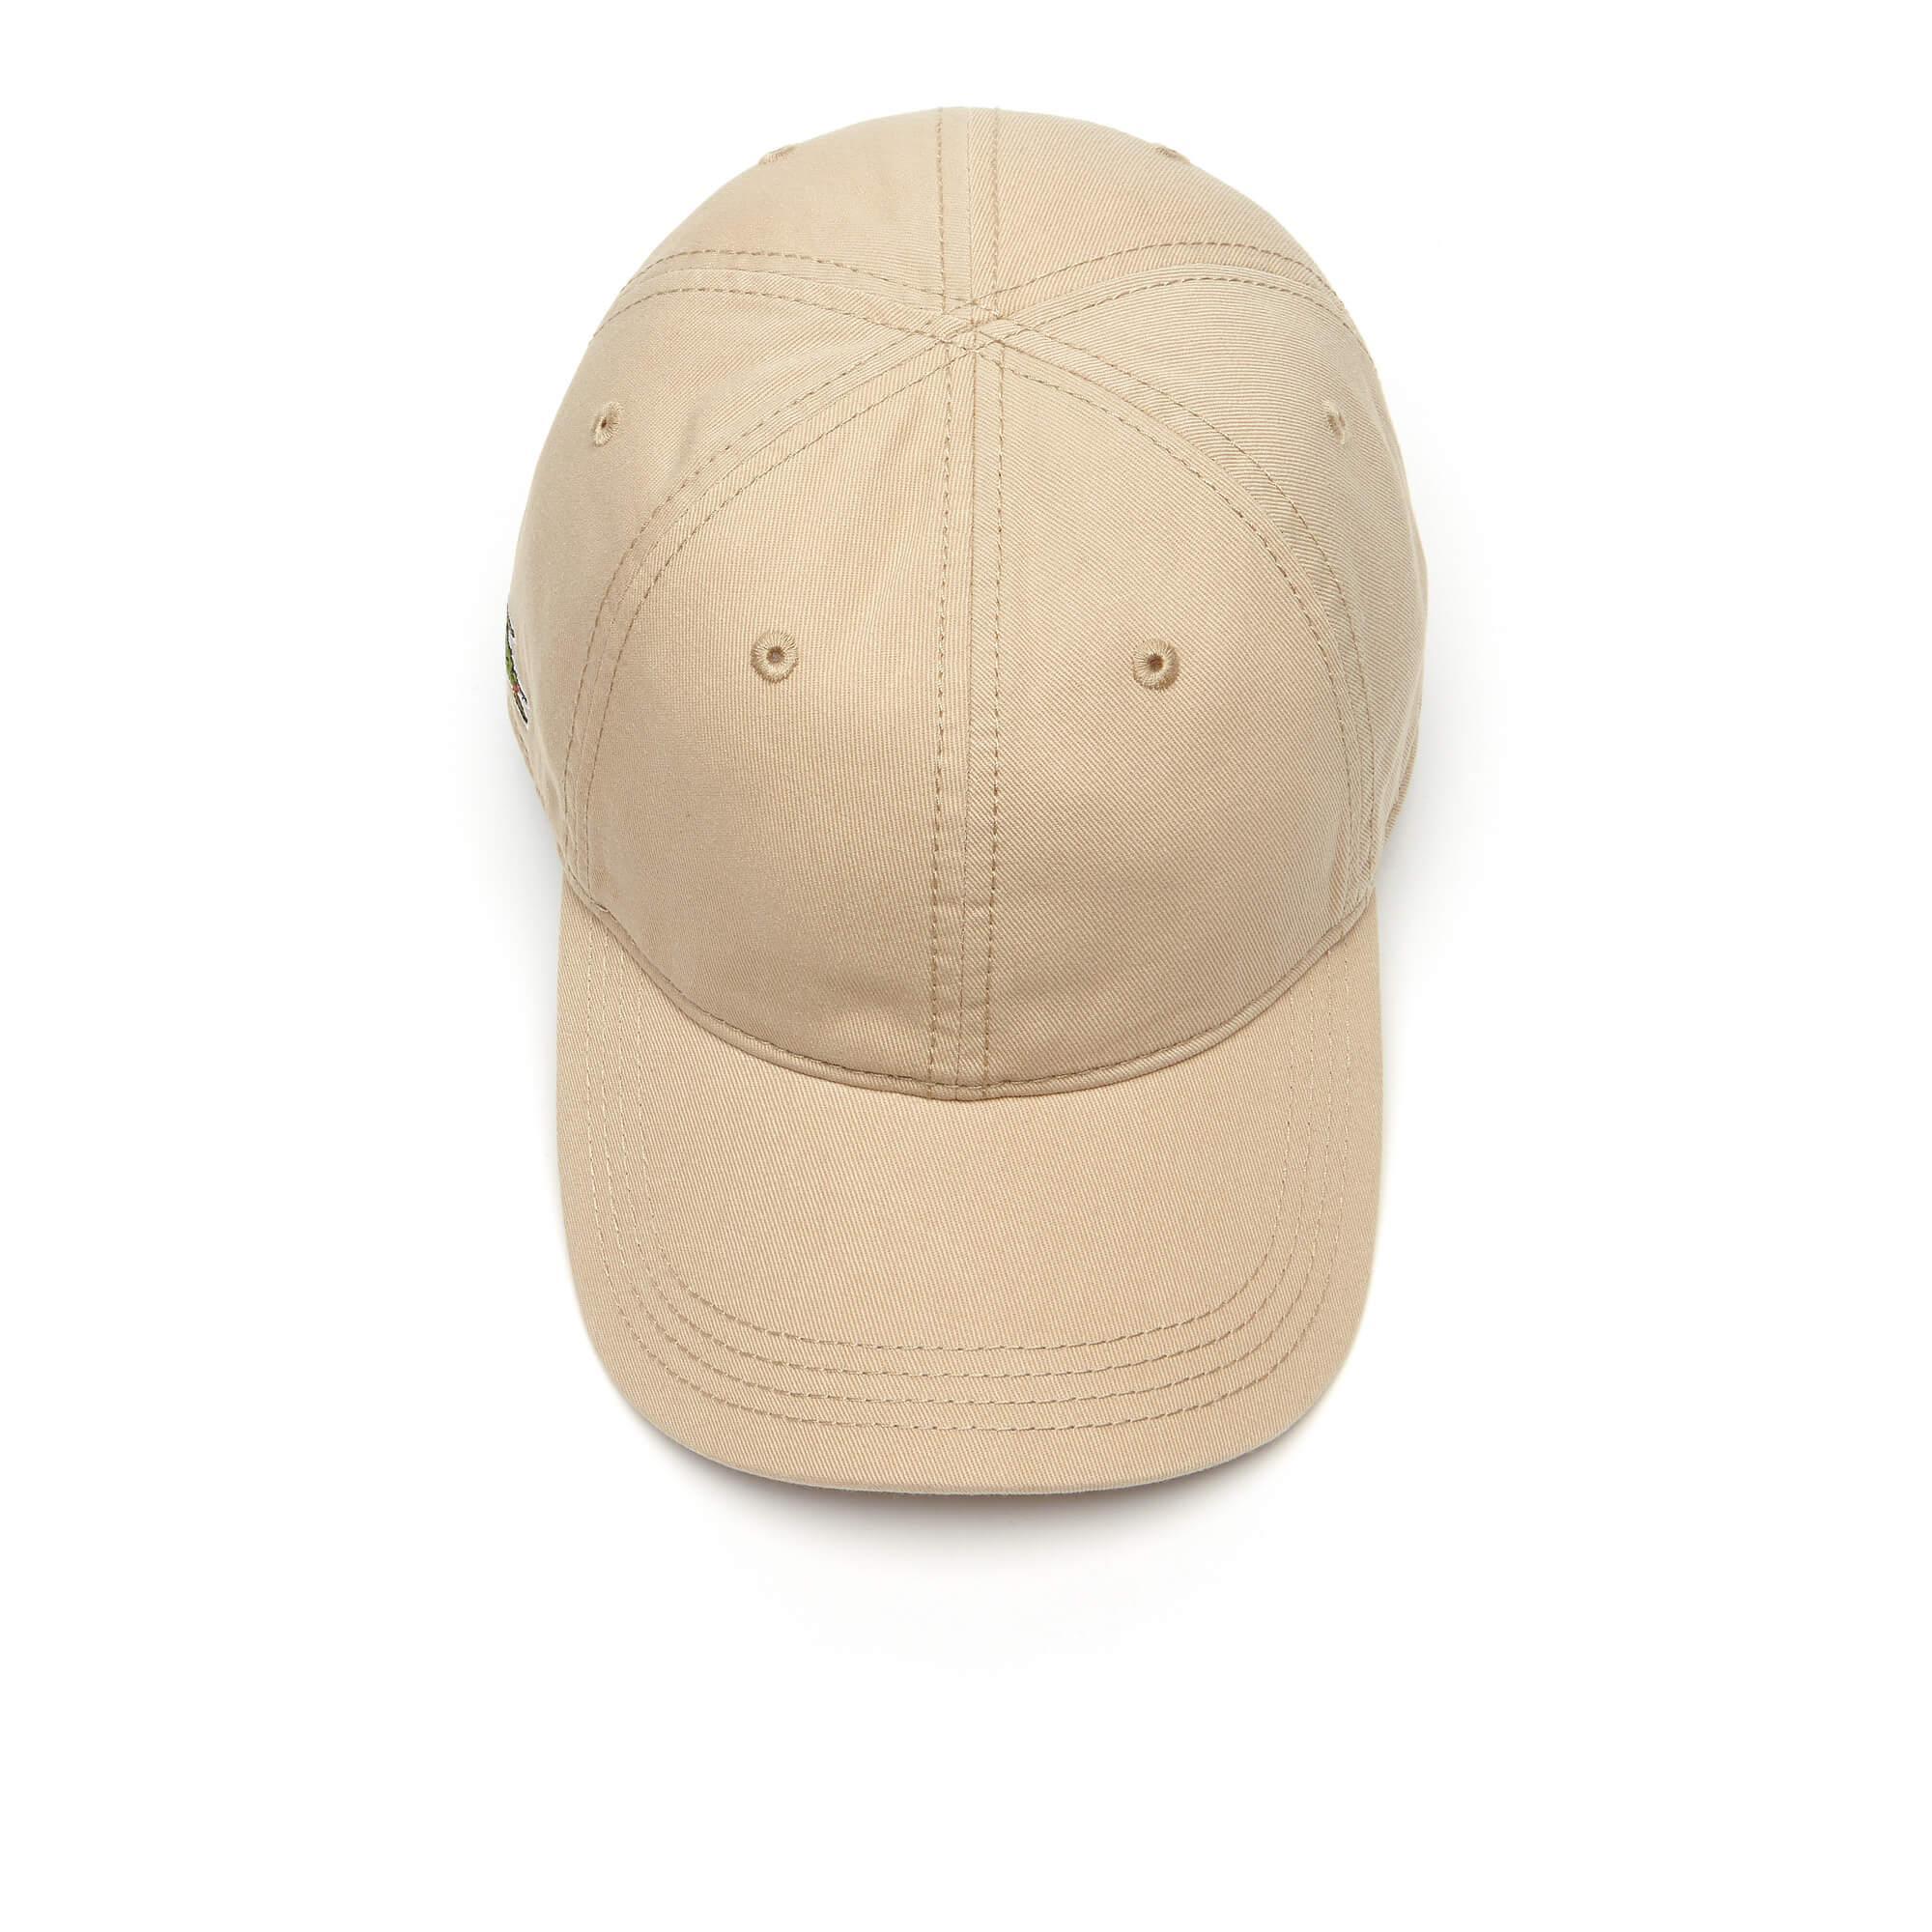 Lacoste Erkek Kahverengi Şapka